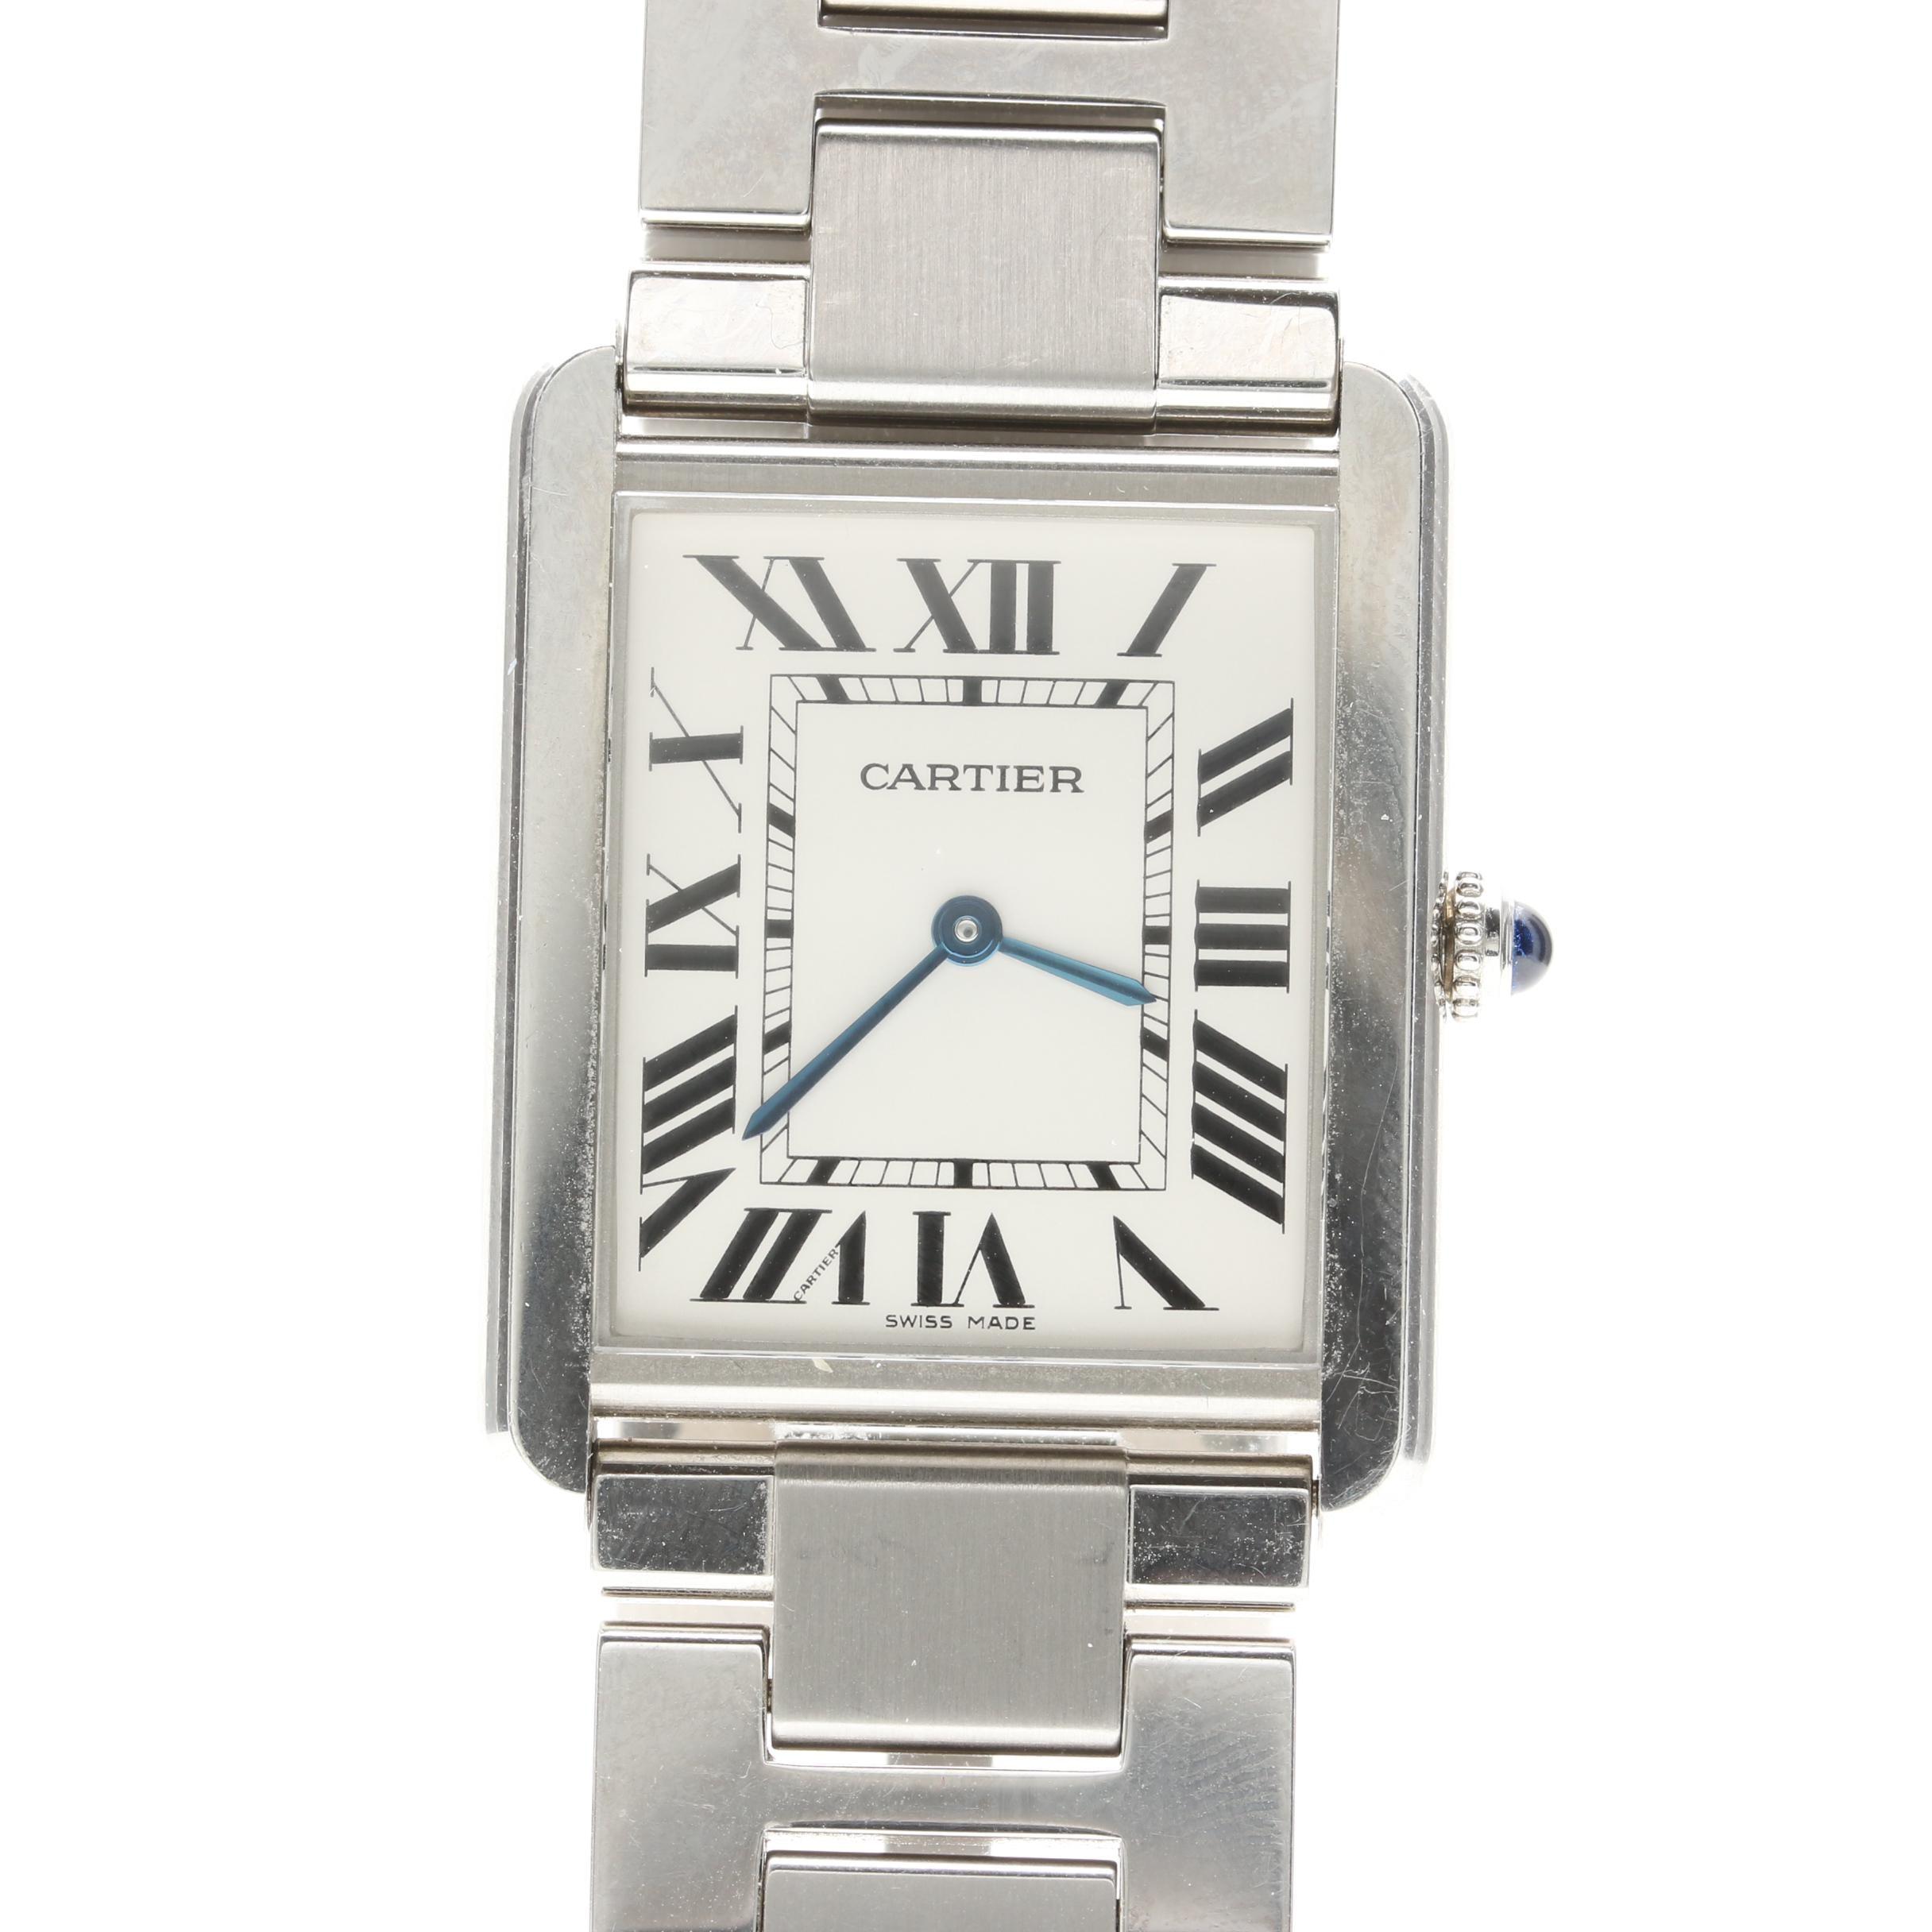 "Cartier ""Tank Solo"" Stainless Steel Wristwatch"